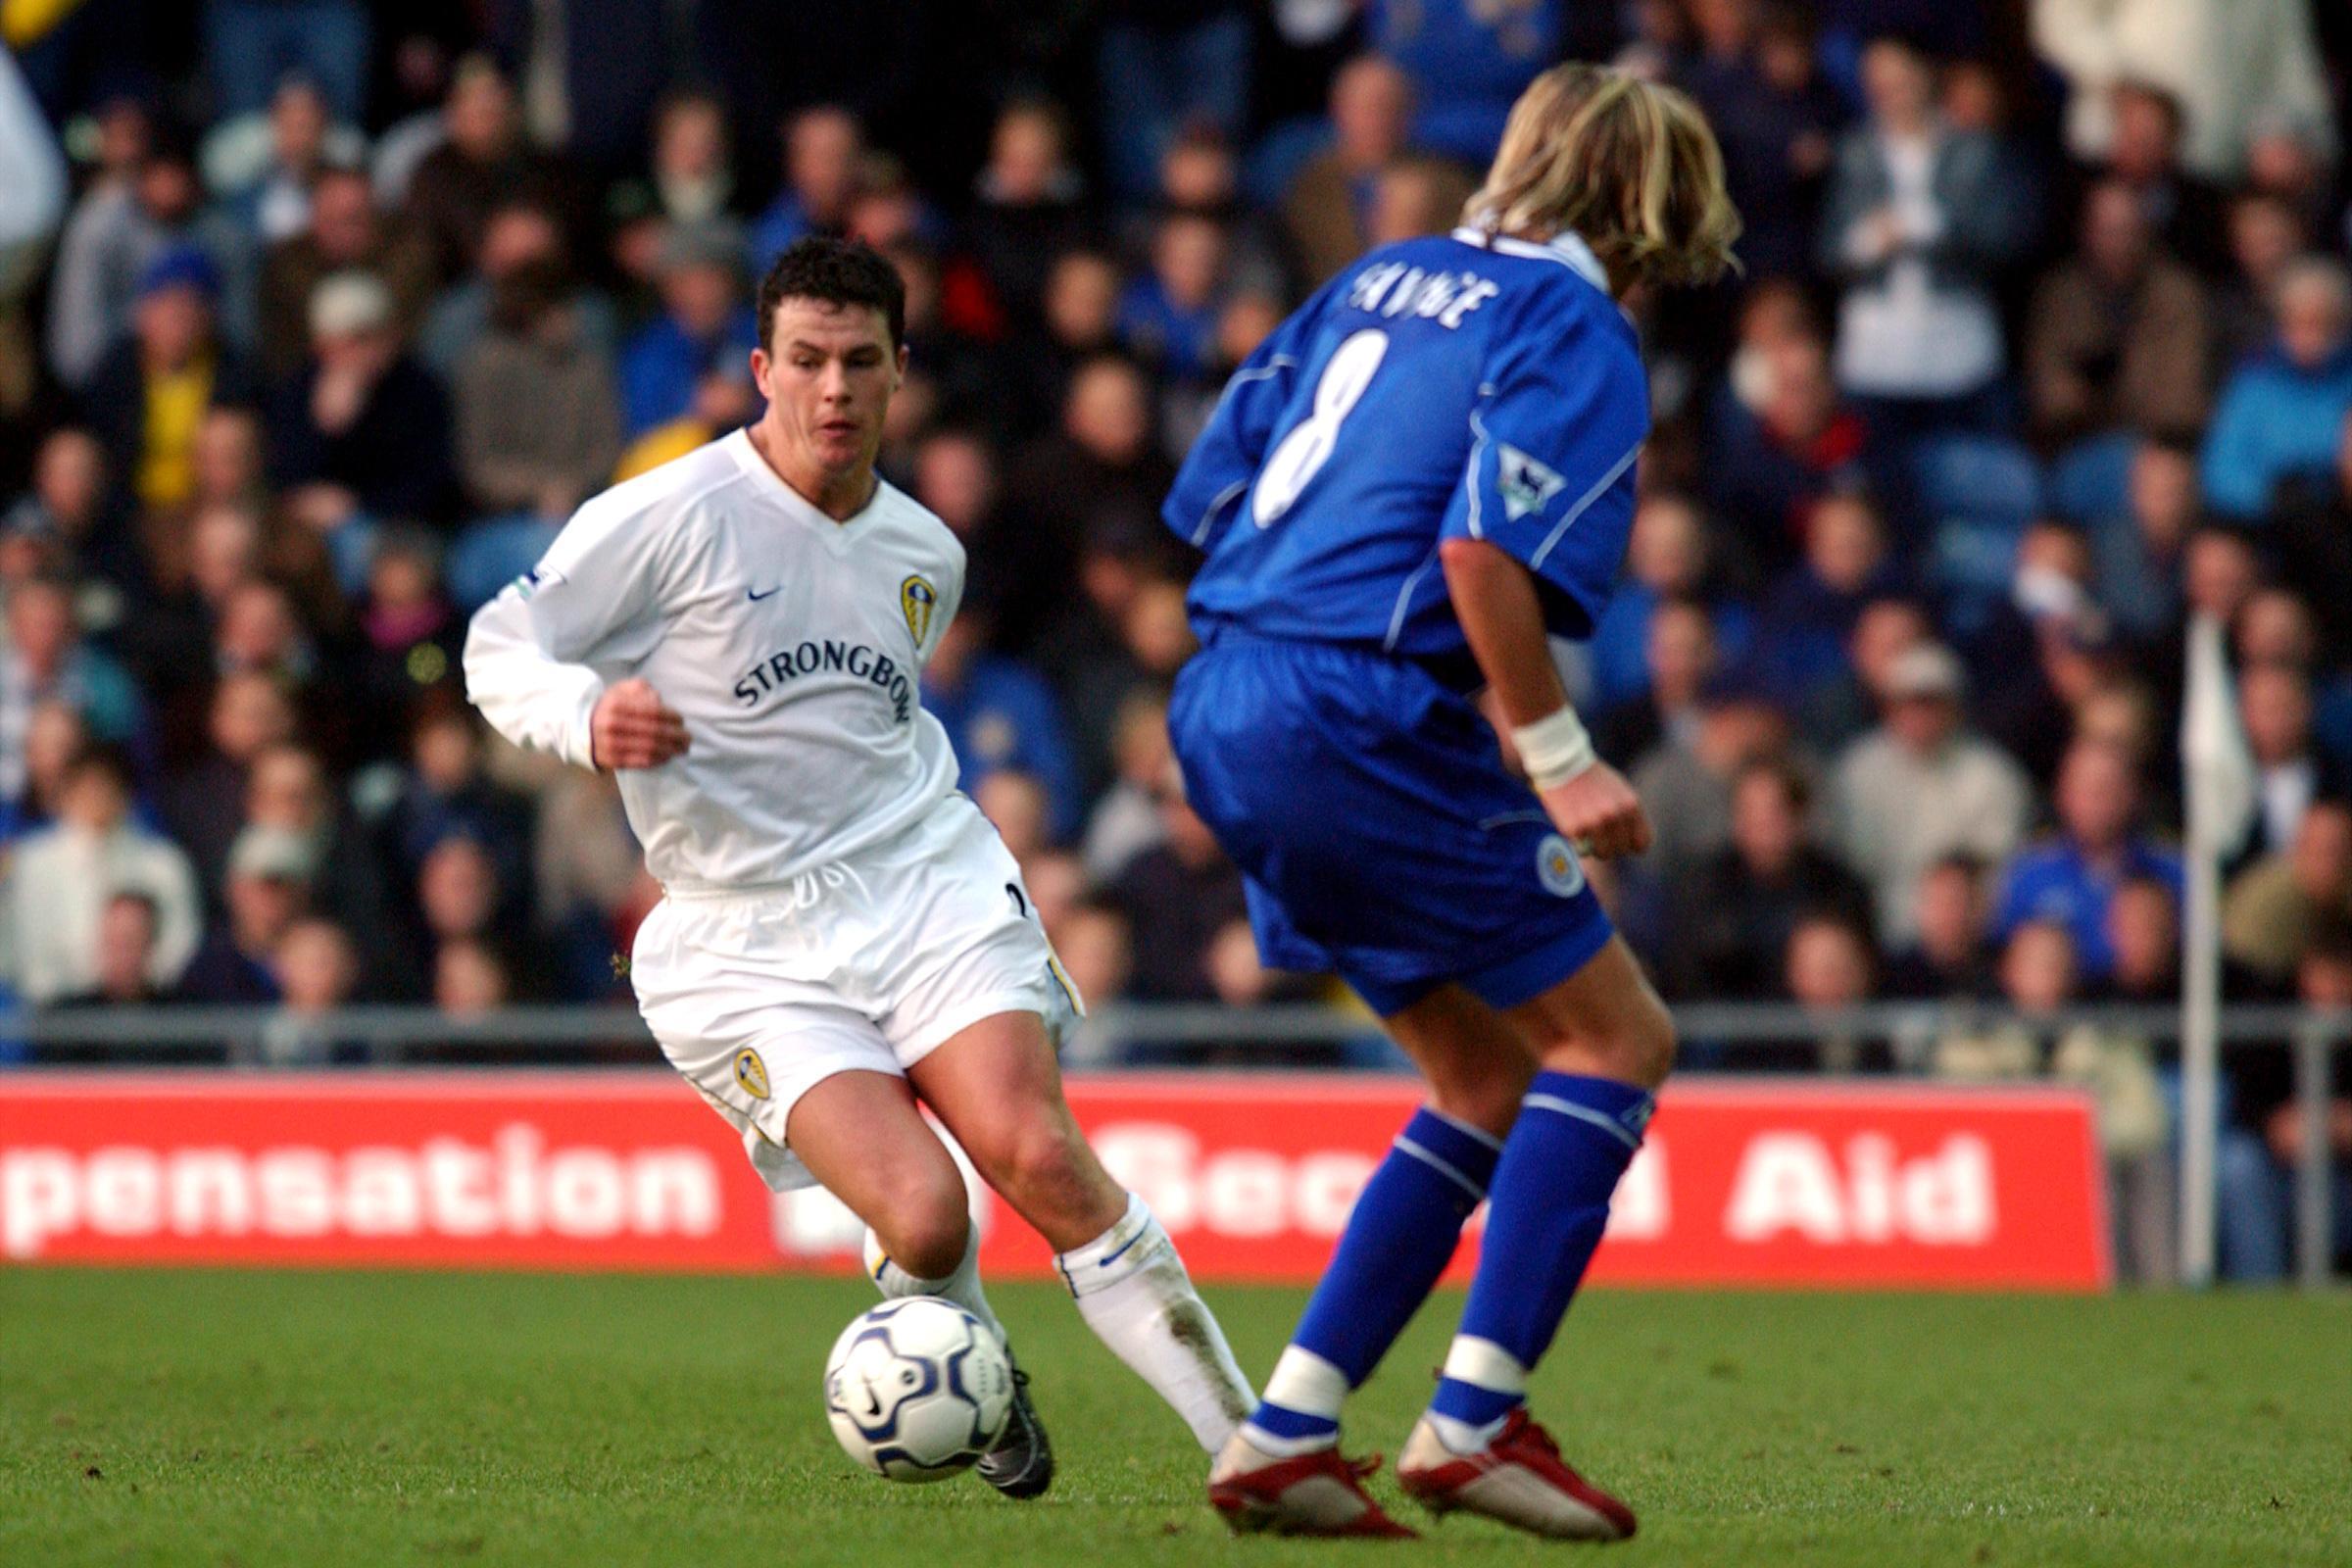 Leeds United's Ian Harte